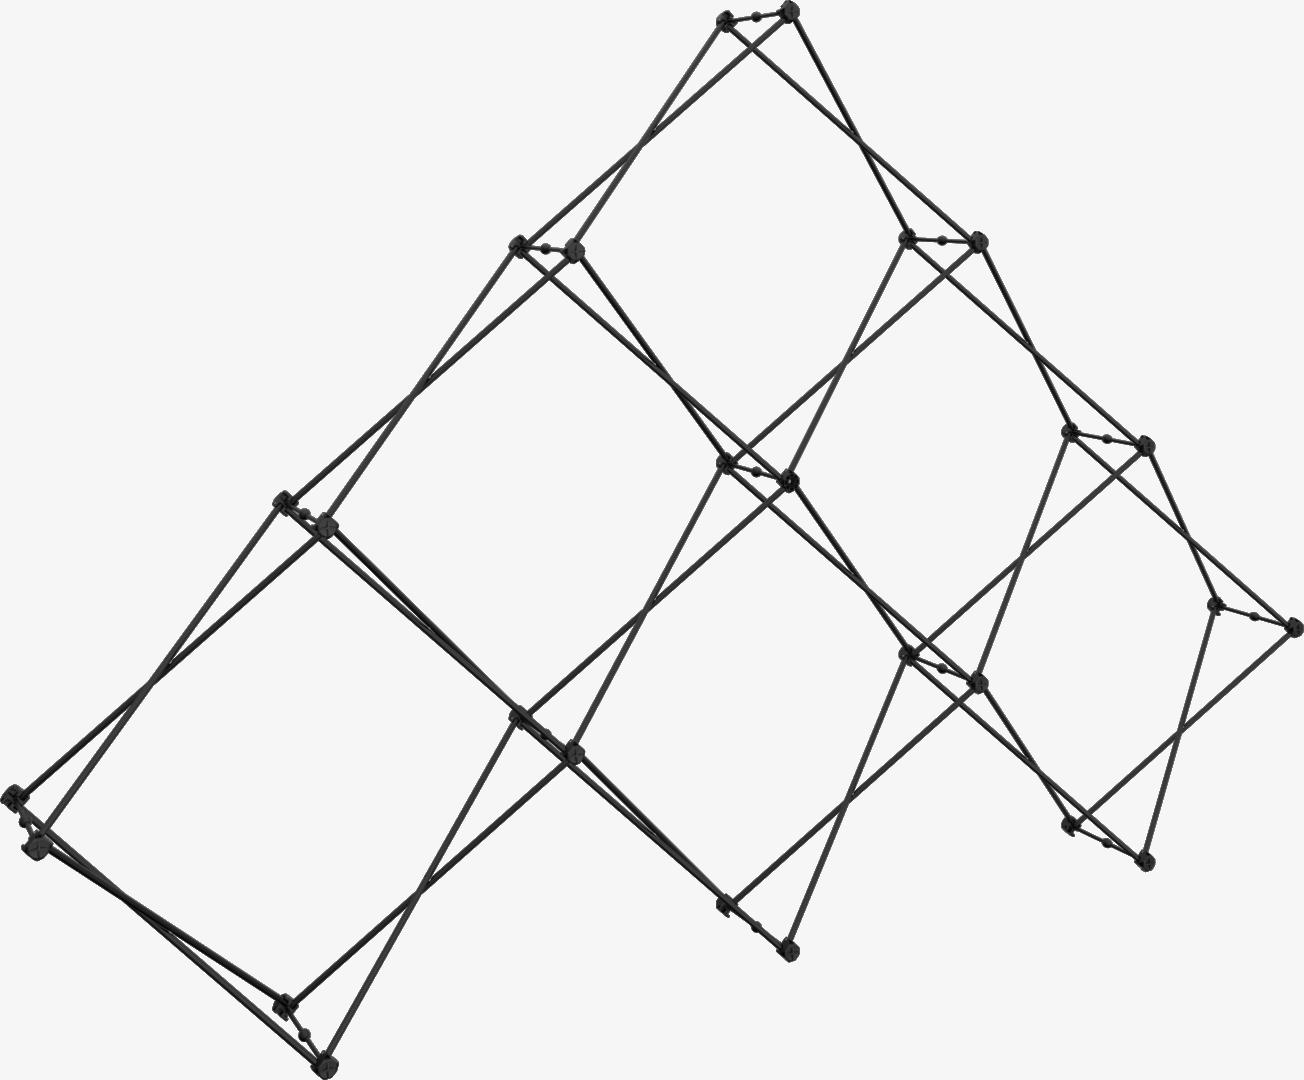 Xclaim 10ft 6 Quad Pyramid Fabric Pop Up Display Frame